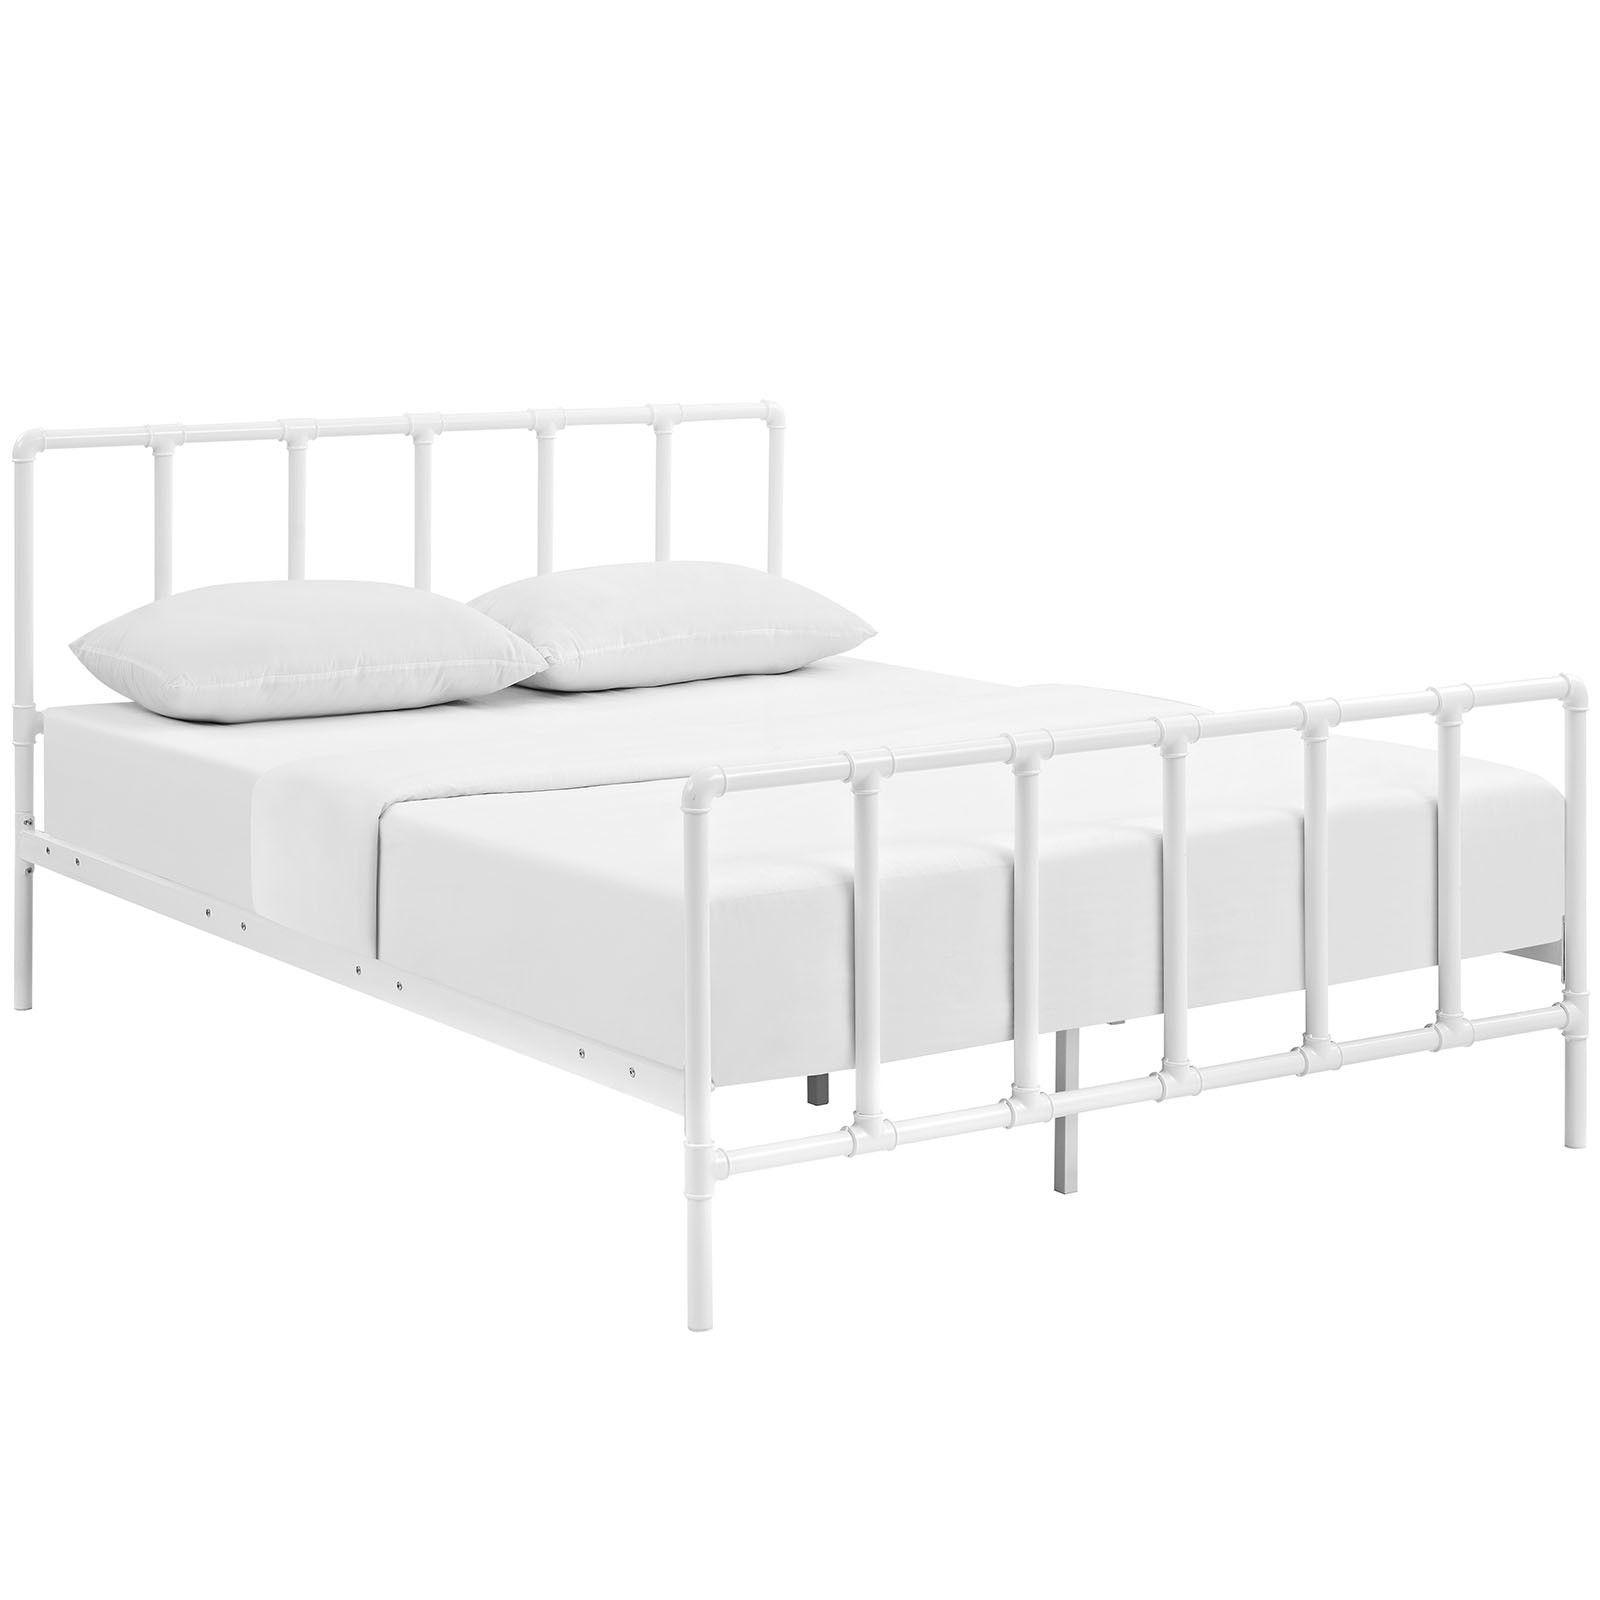 Dower platform bed platform beds and products